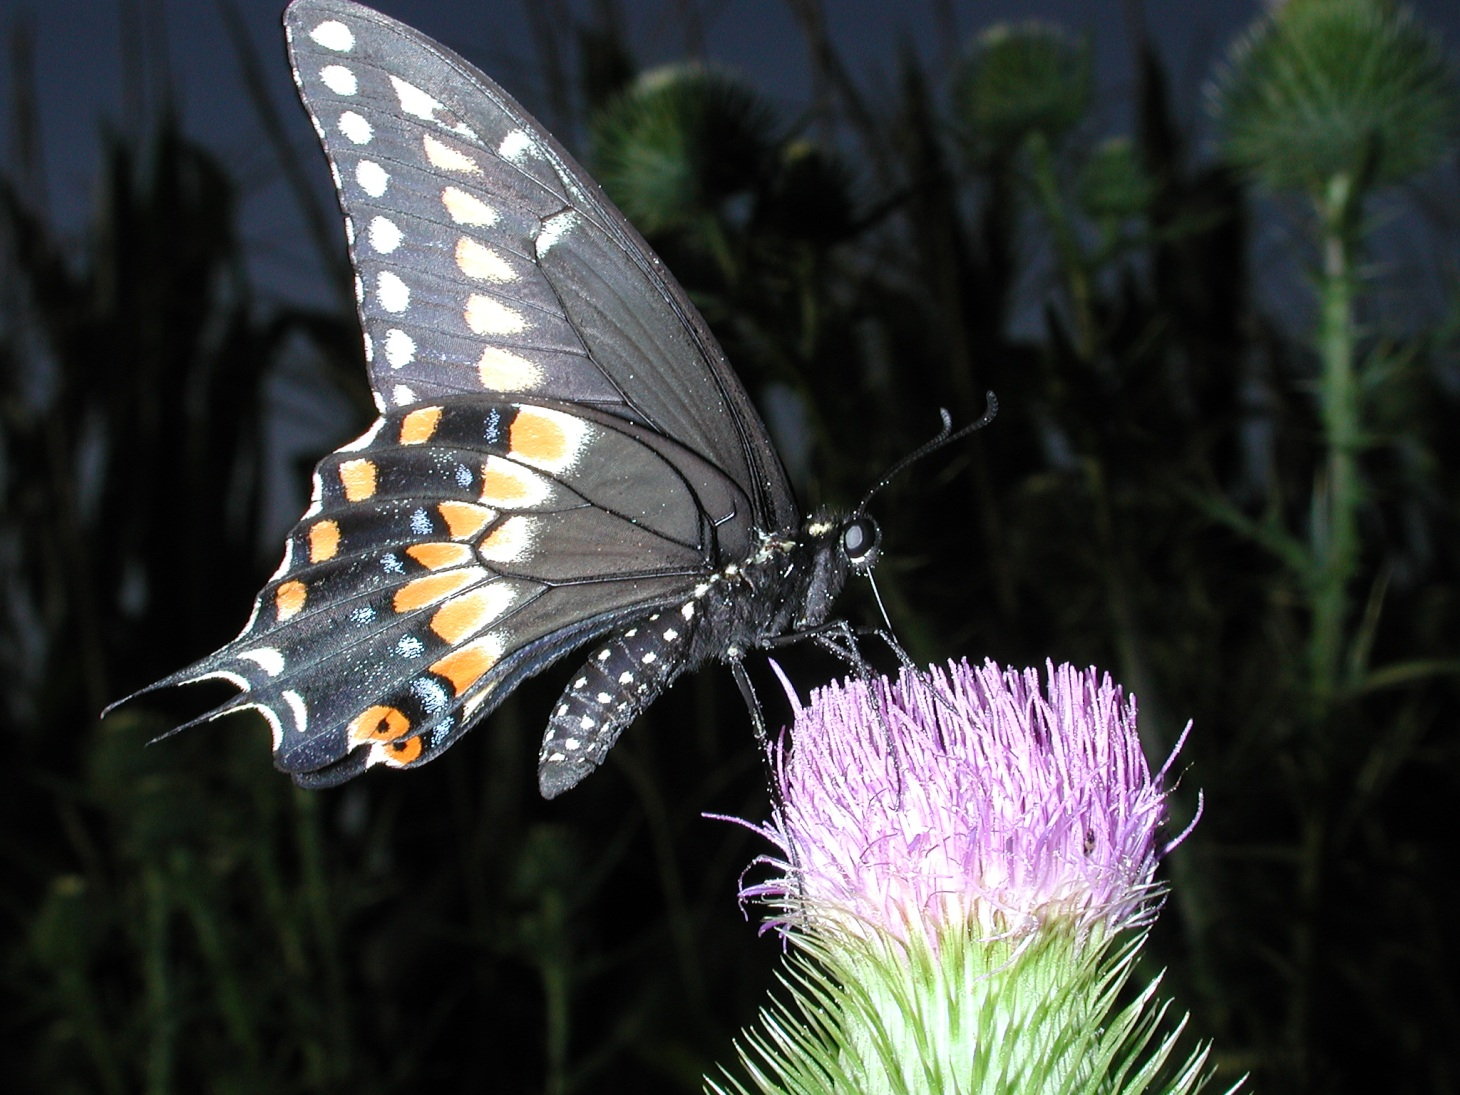 Black Swallowtail pic by Thomas Peace c. 2012